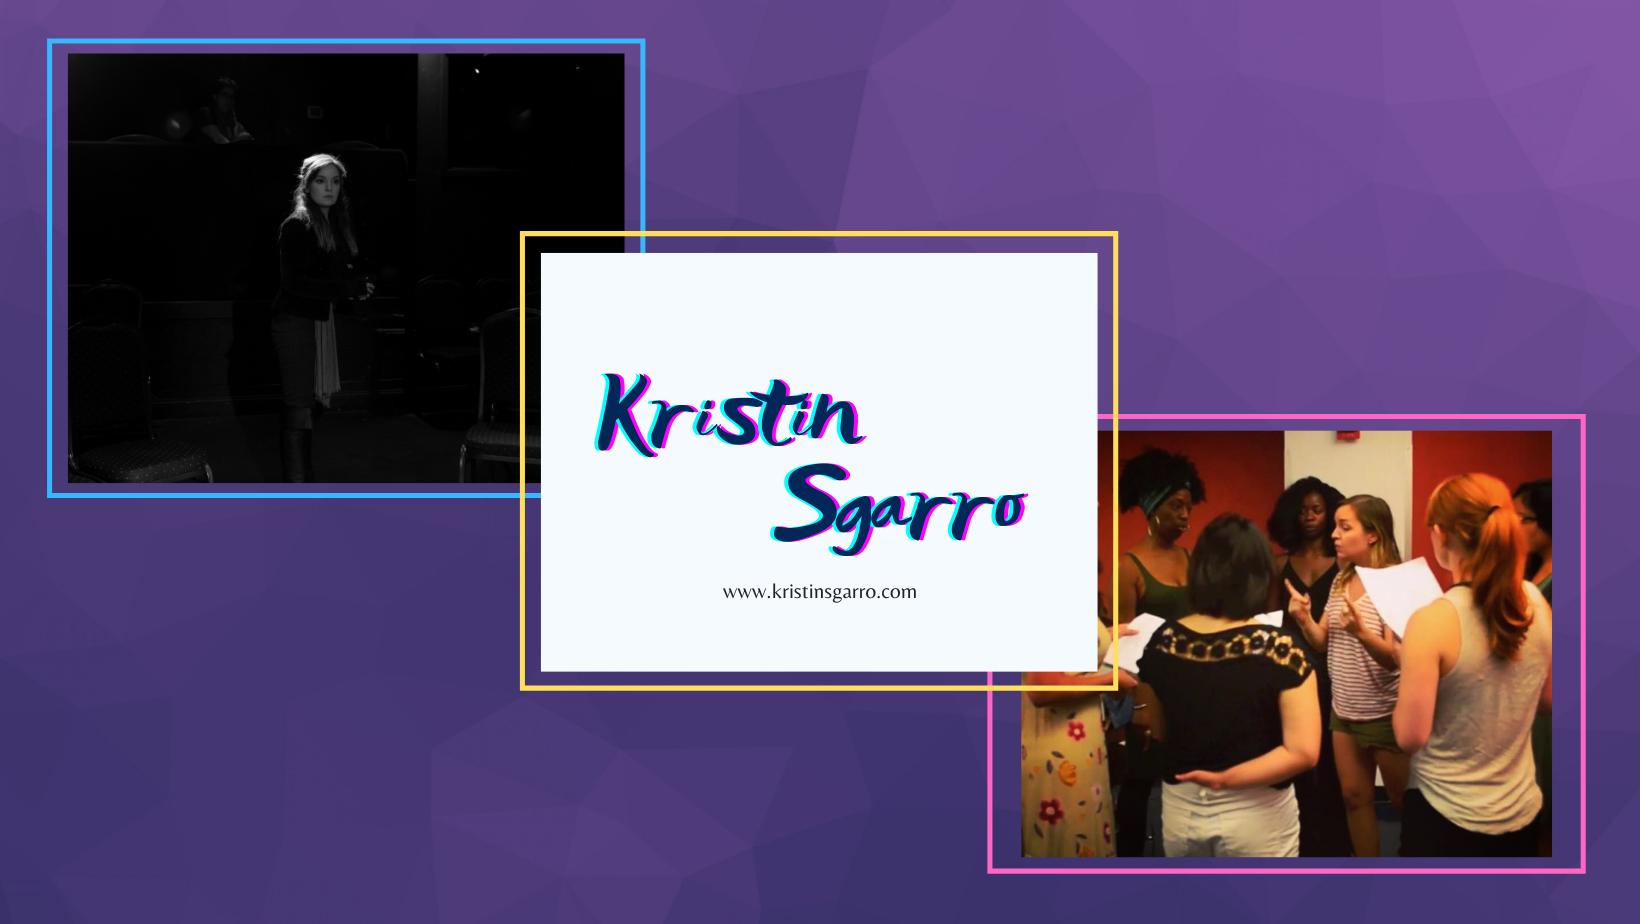 editor-uploaded image of Kristin Sgarro